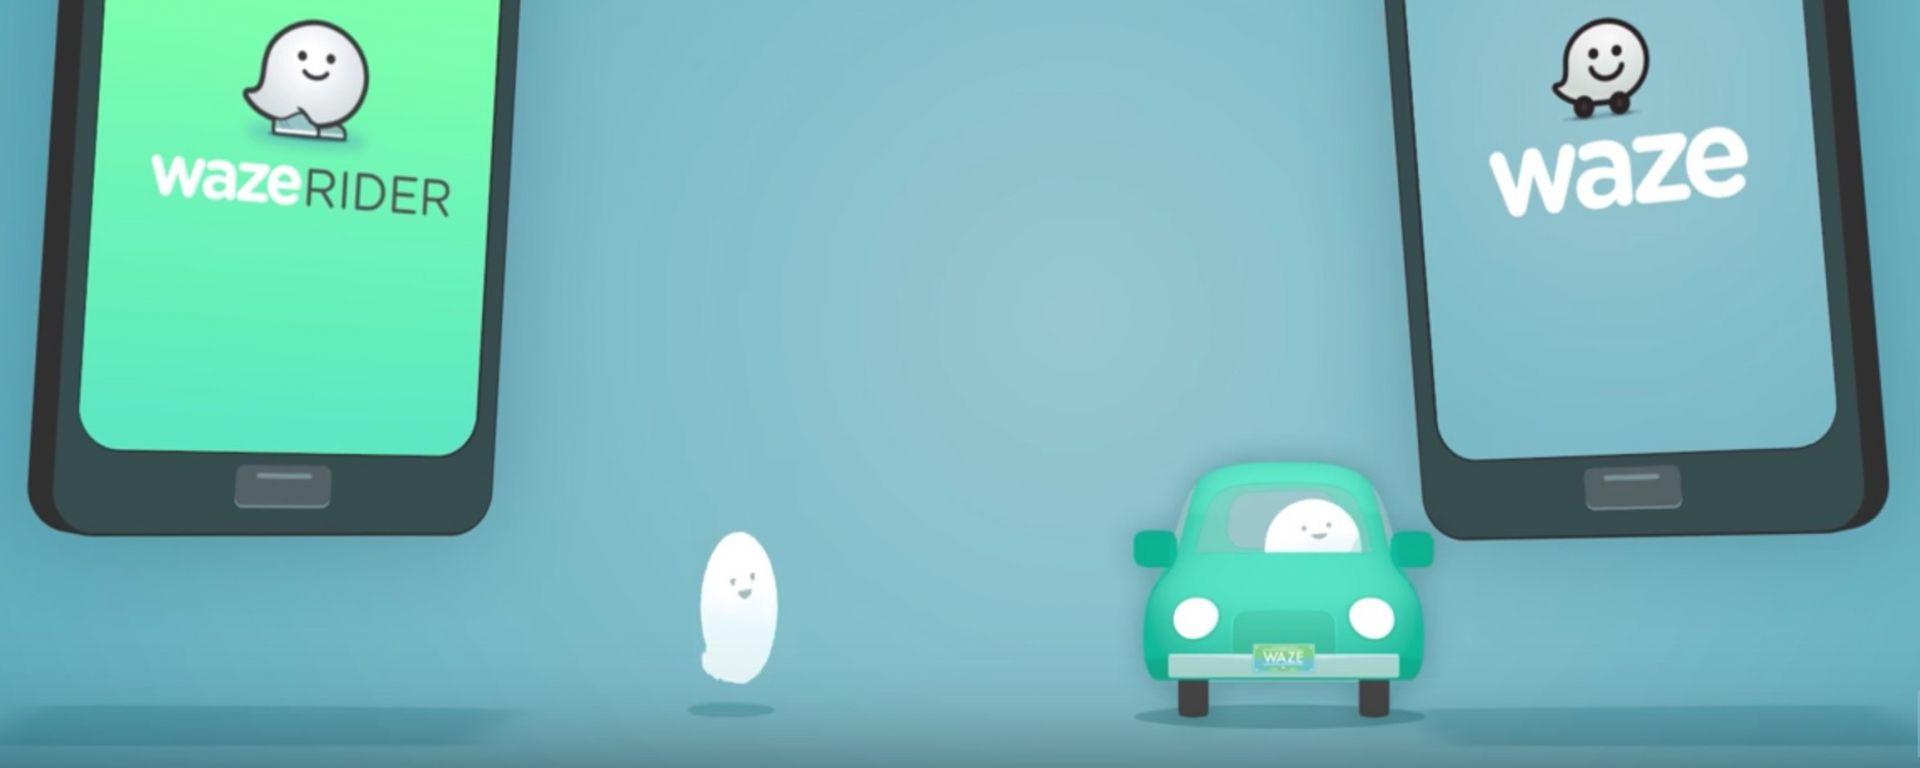 Waze Rider: Google lancia il ride sharing anti Uber